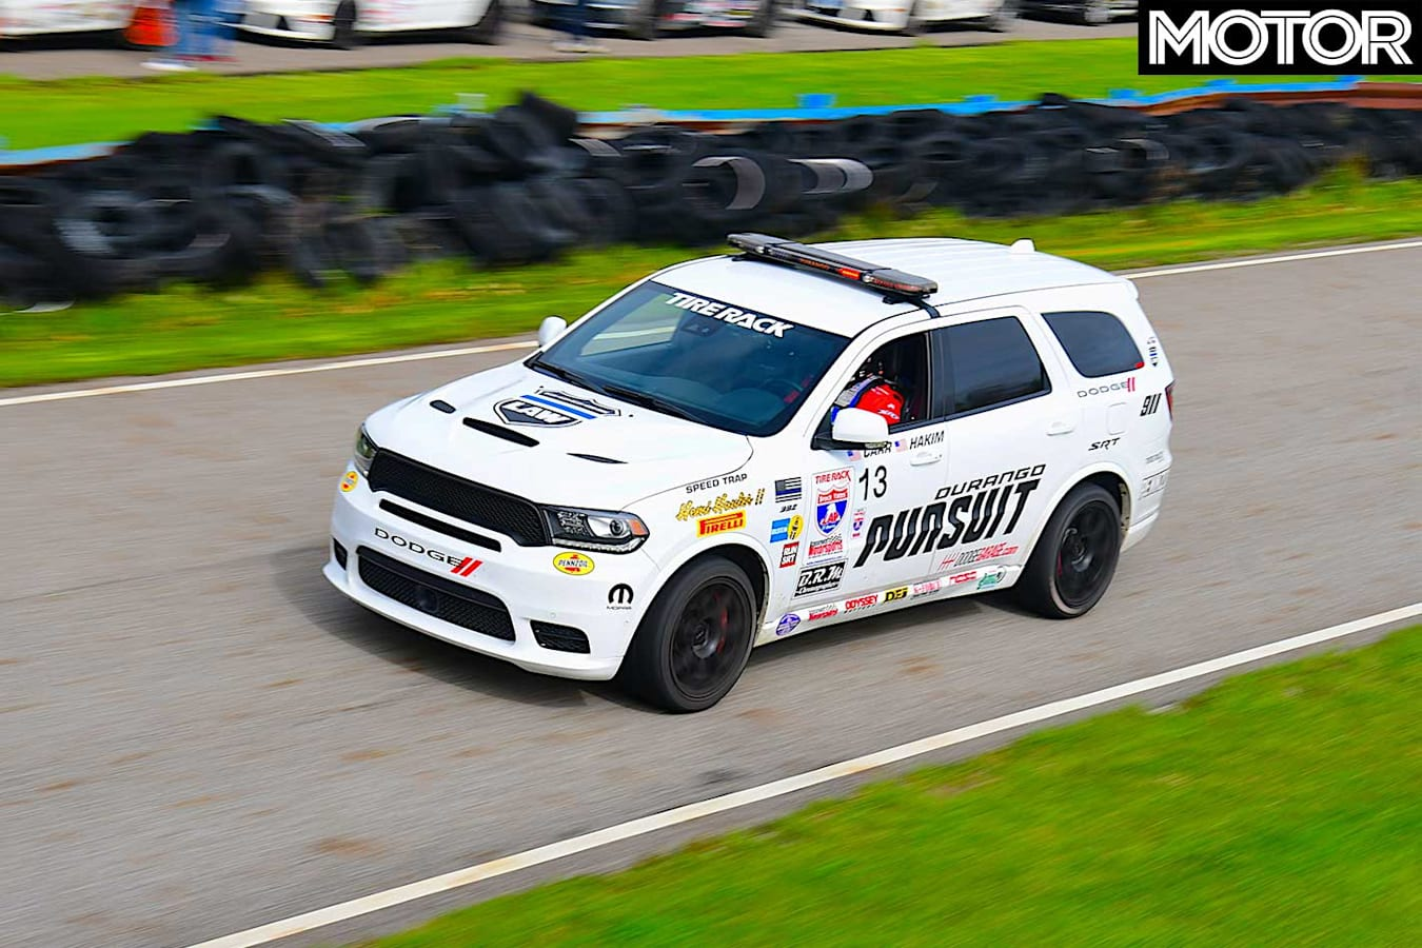 Durango Pursuit Speed Trap Lap Of America Front Jpg